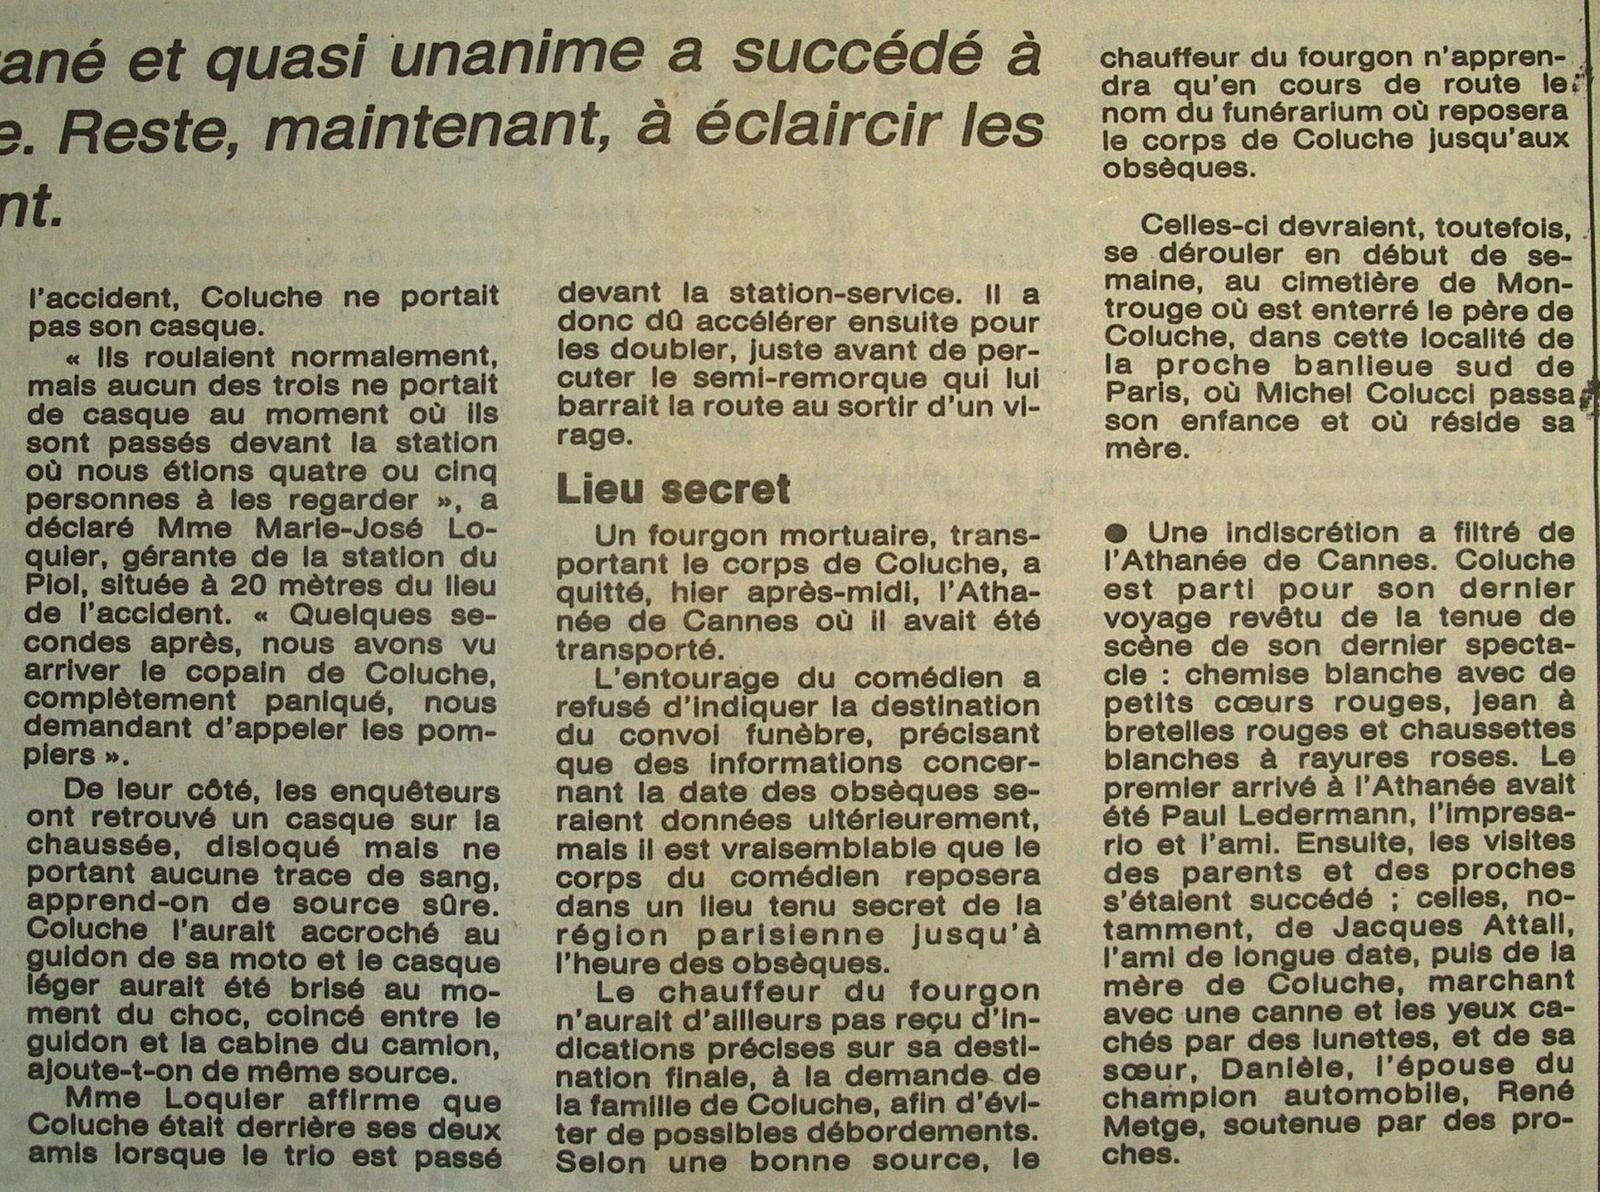 Deuil-populaire-apres-mort-Coluche.JPG